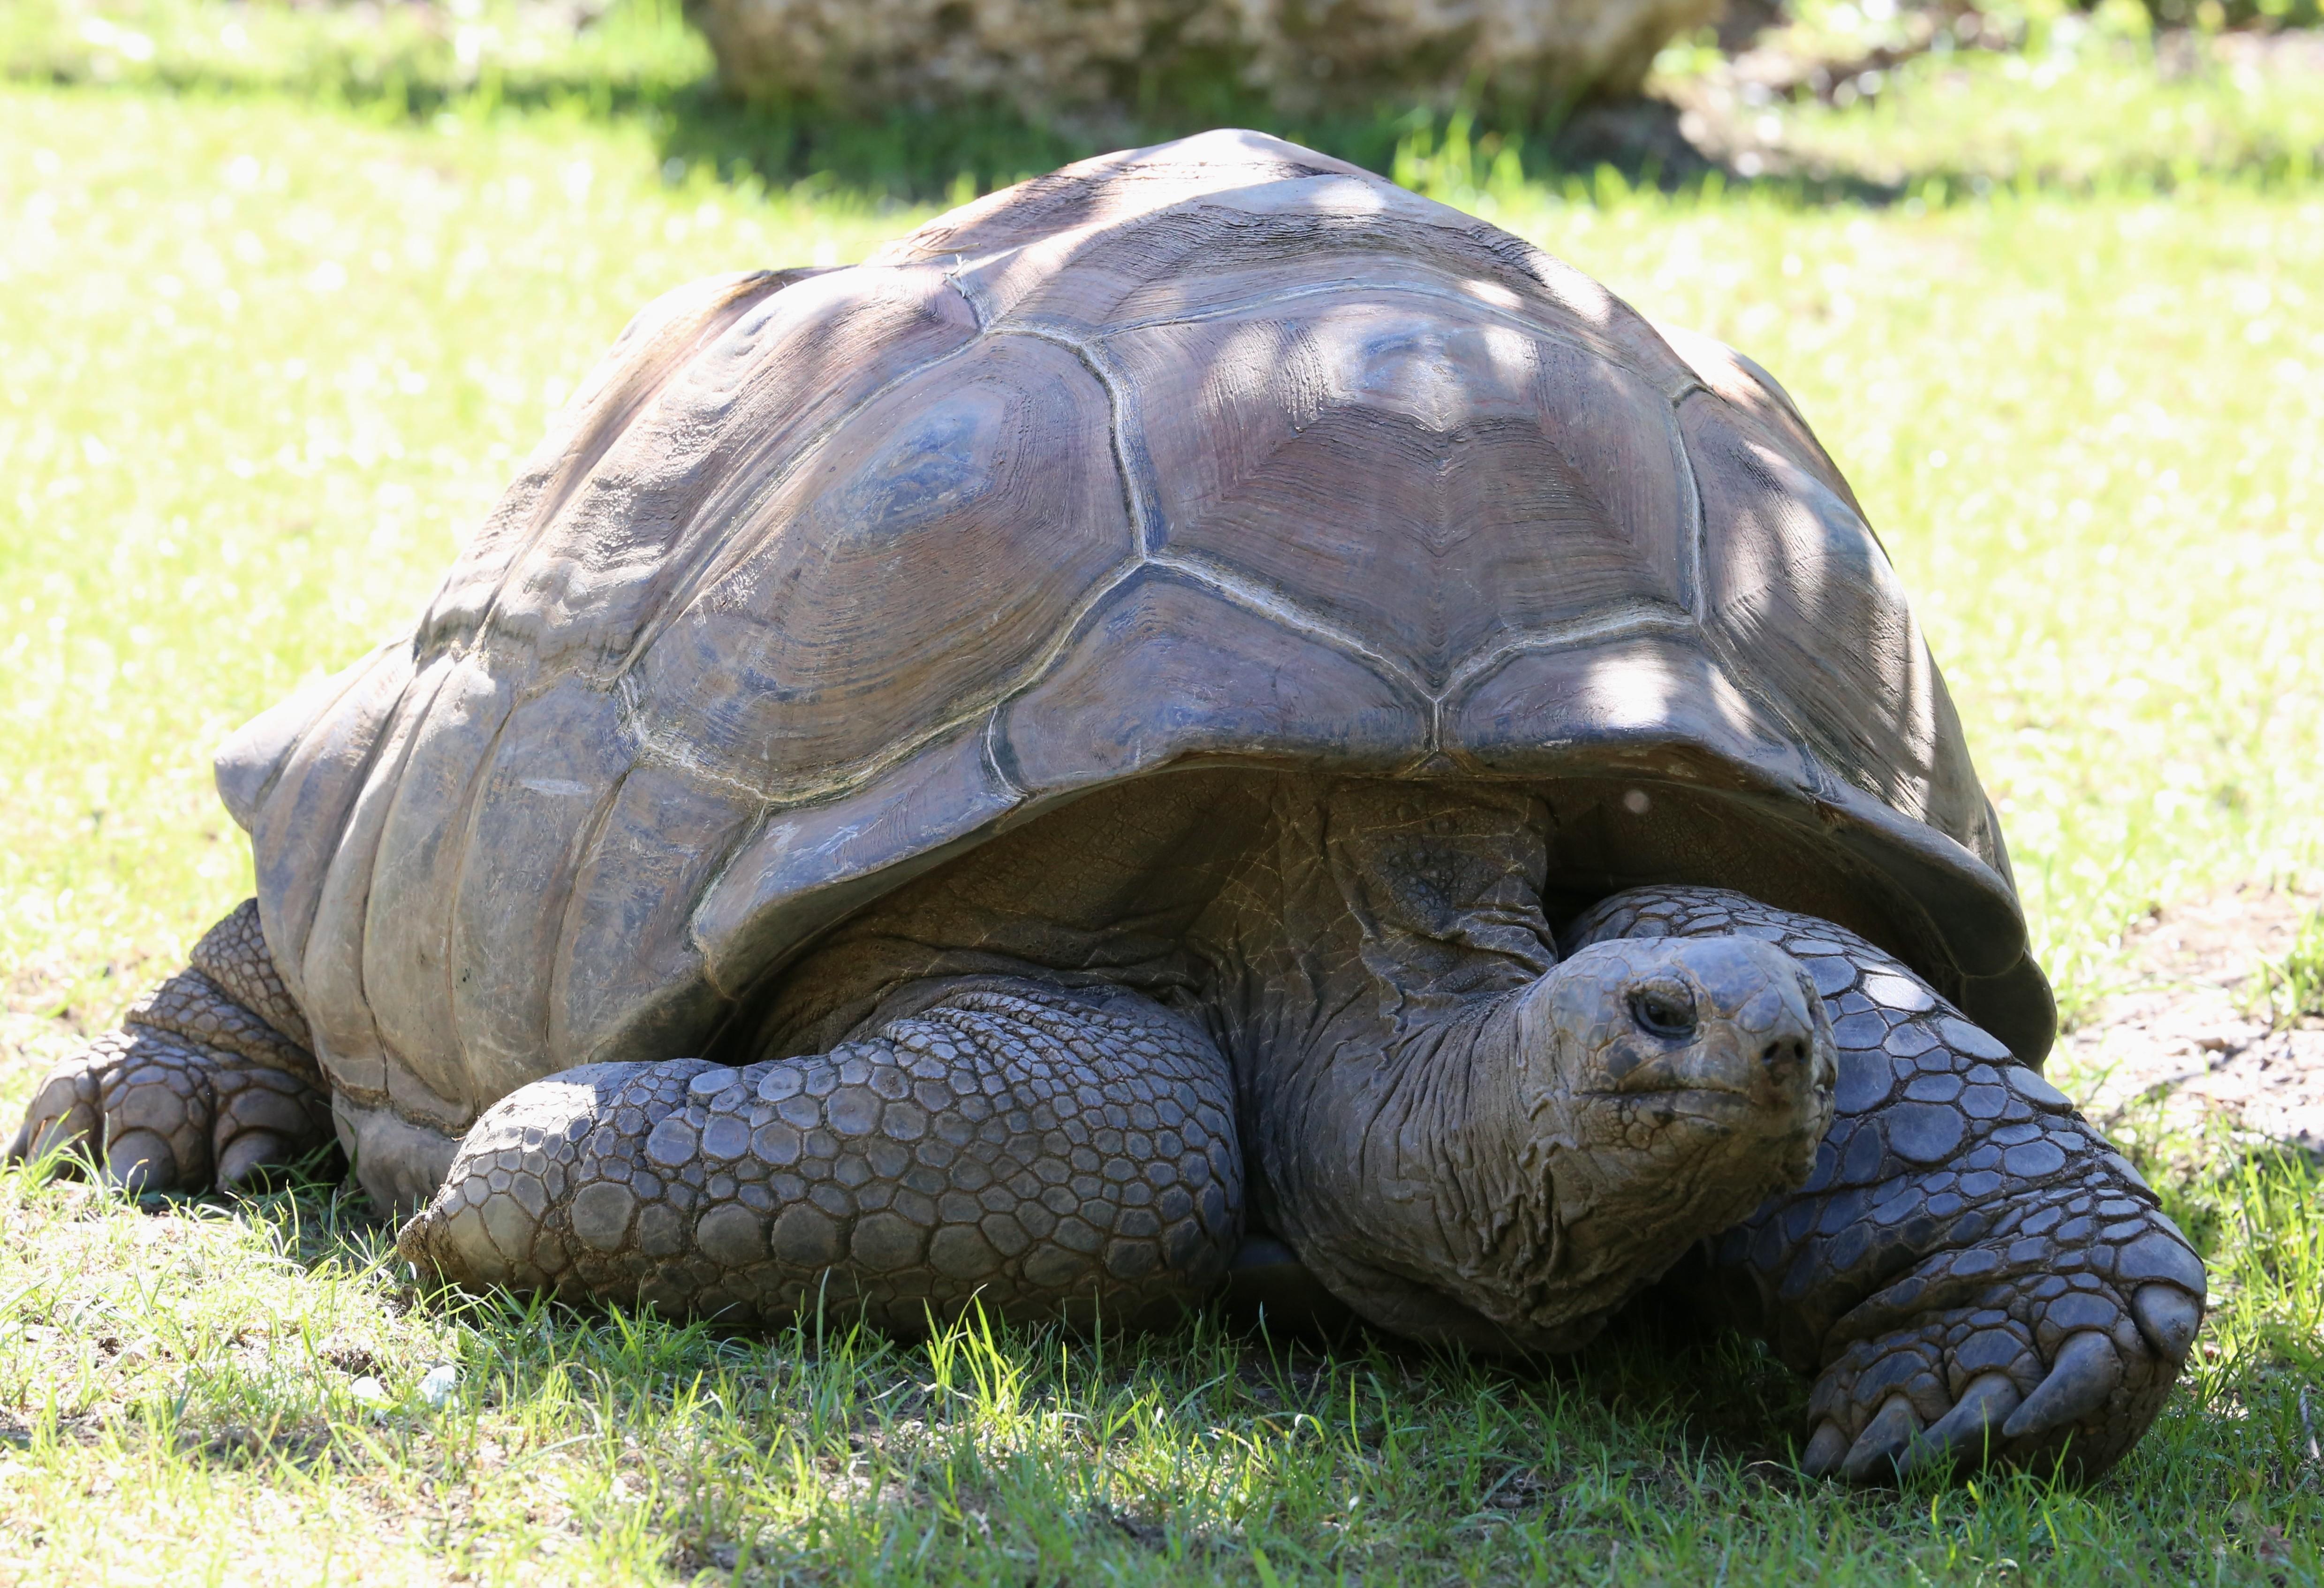 Aldabra giant tortoise wikipedia aldabra giant tortoise publicscrutiny Gallery